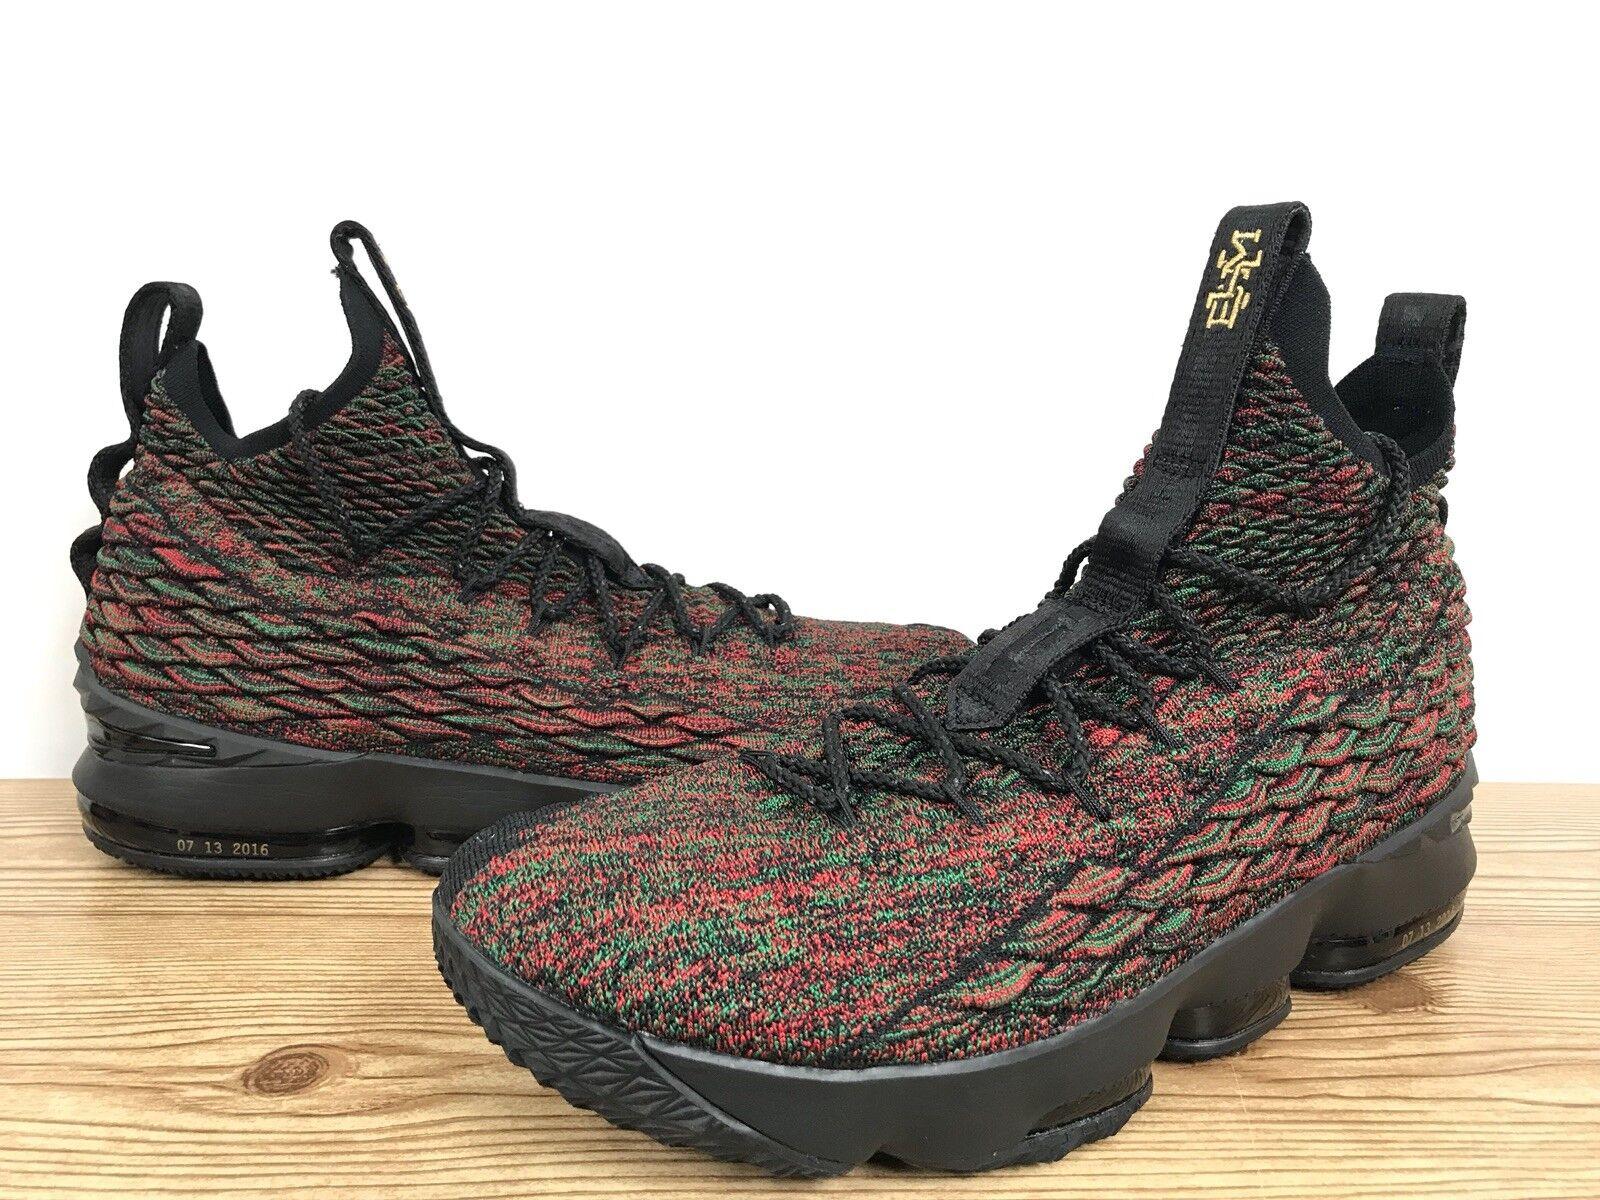 eb7891b0f8 Nike Lebron 15 XV LMTD BHM Sz 15 Black History Month Multi-color 897650-